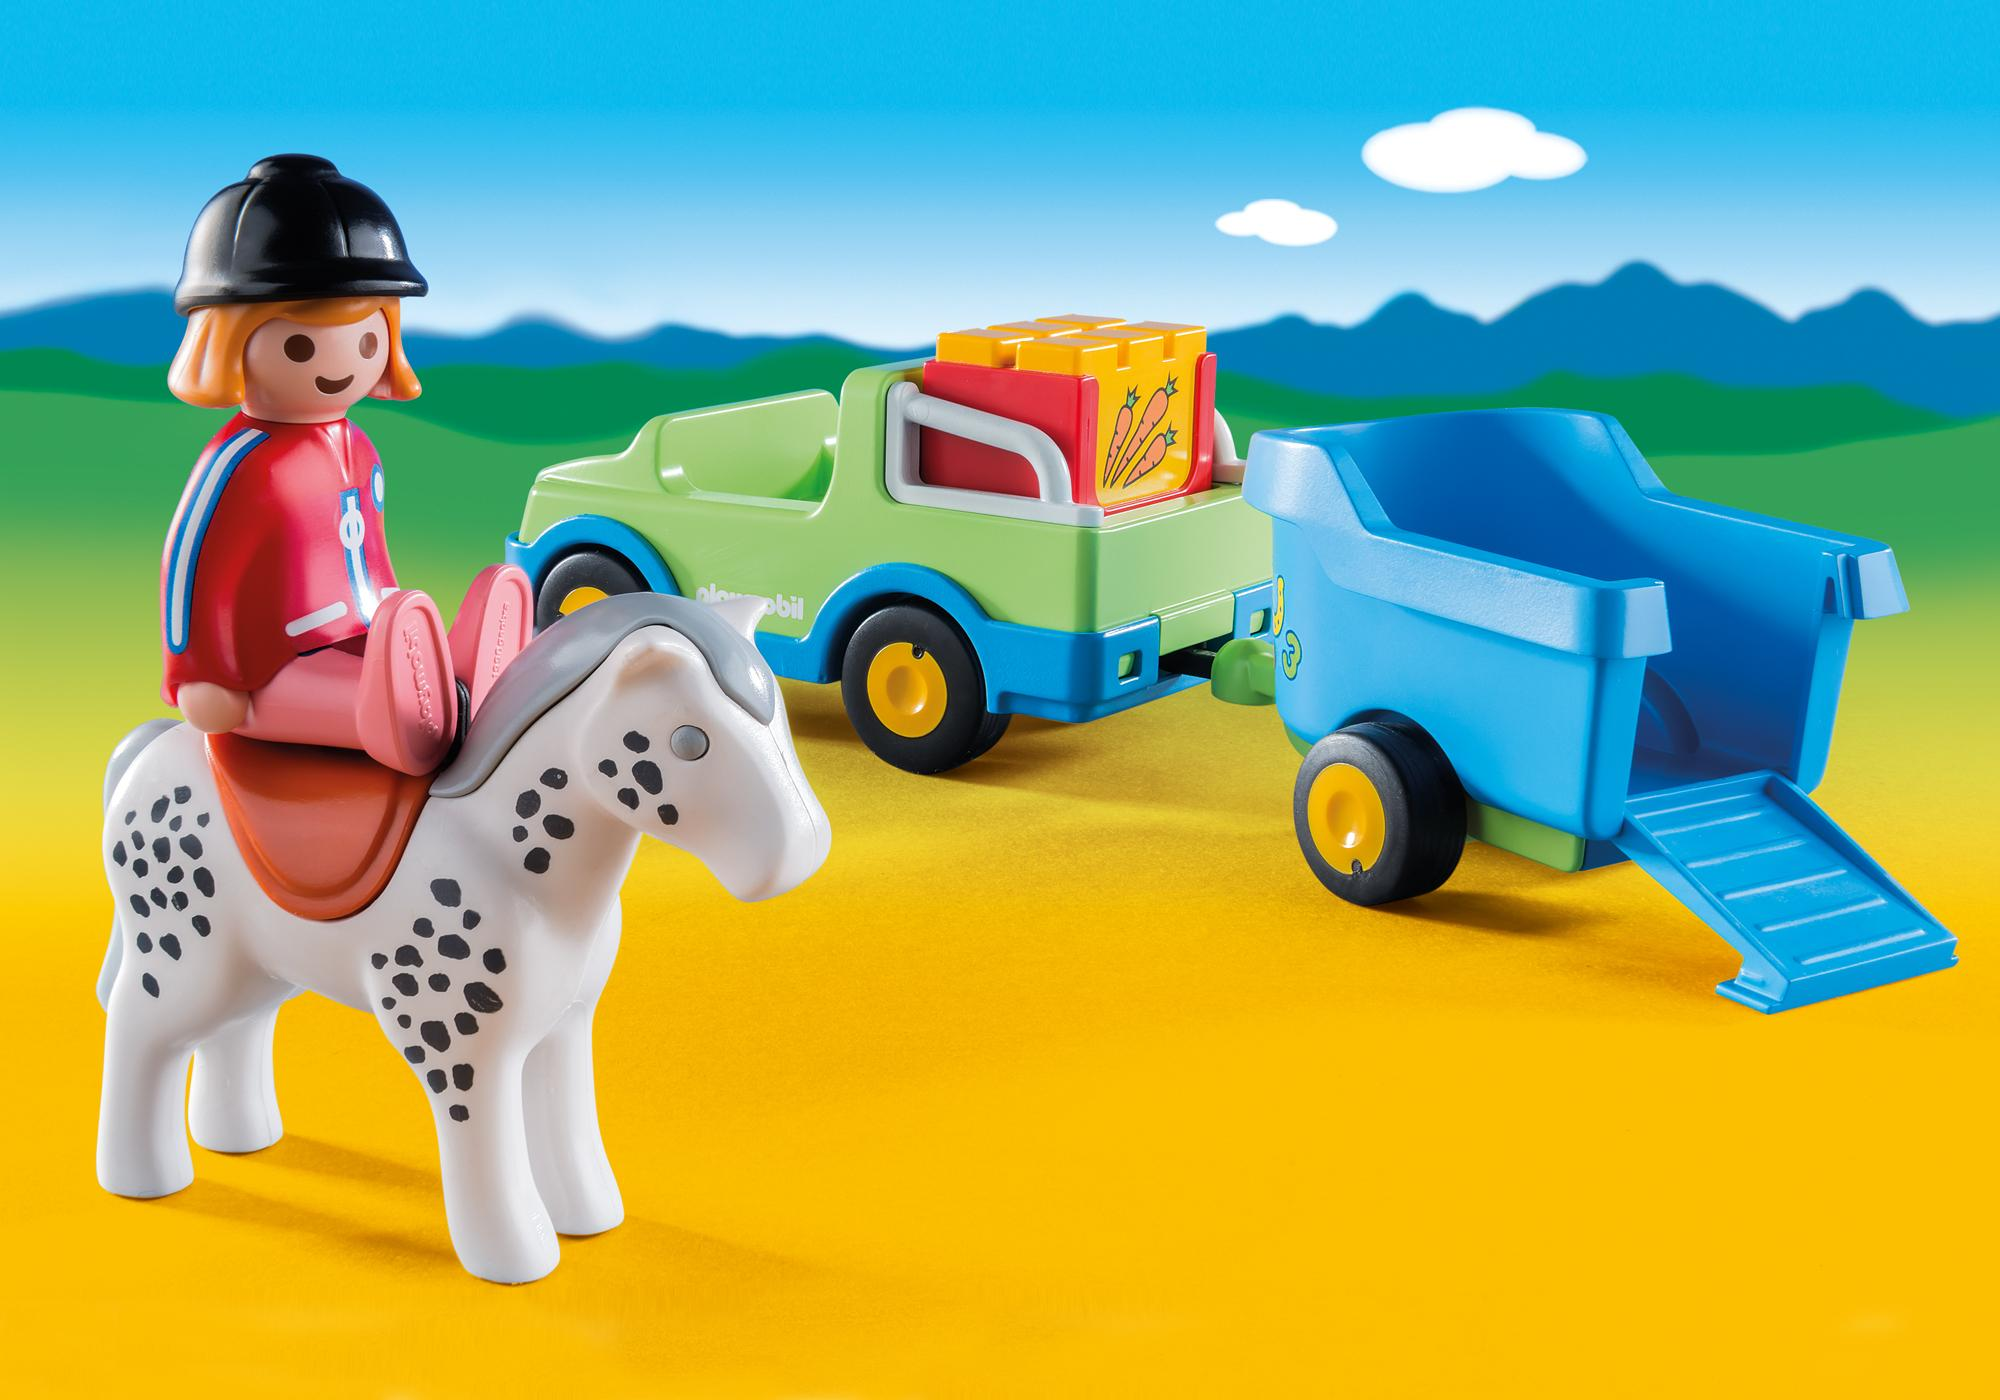 http://media.playmobil.com/i/playmobil/6958_product_extra1